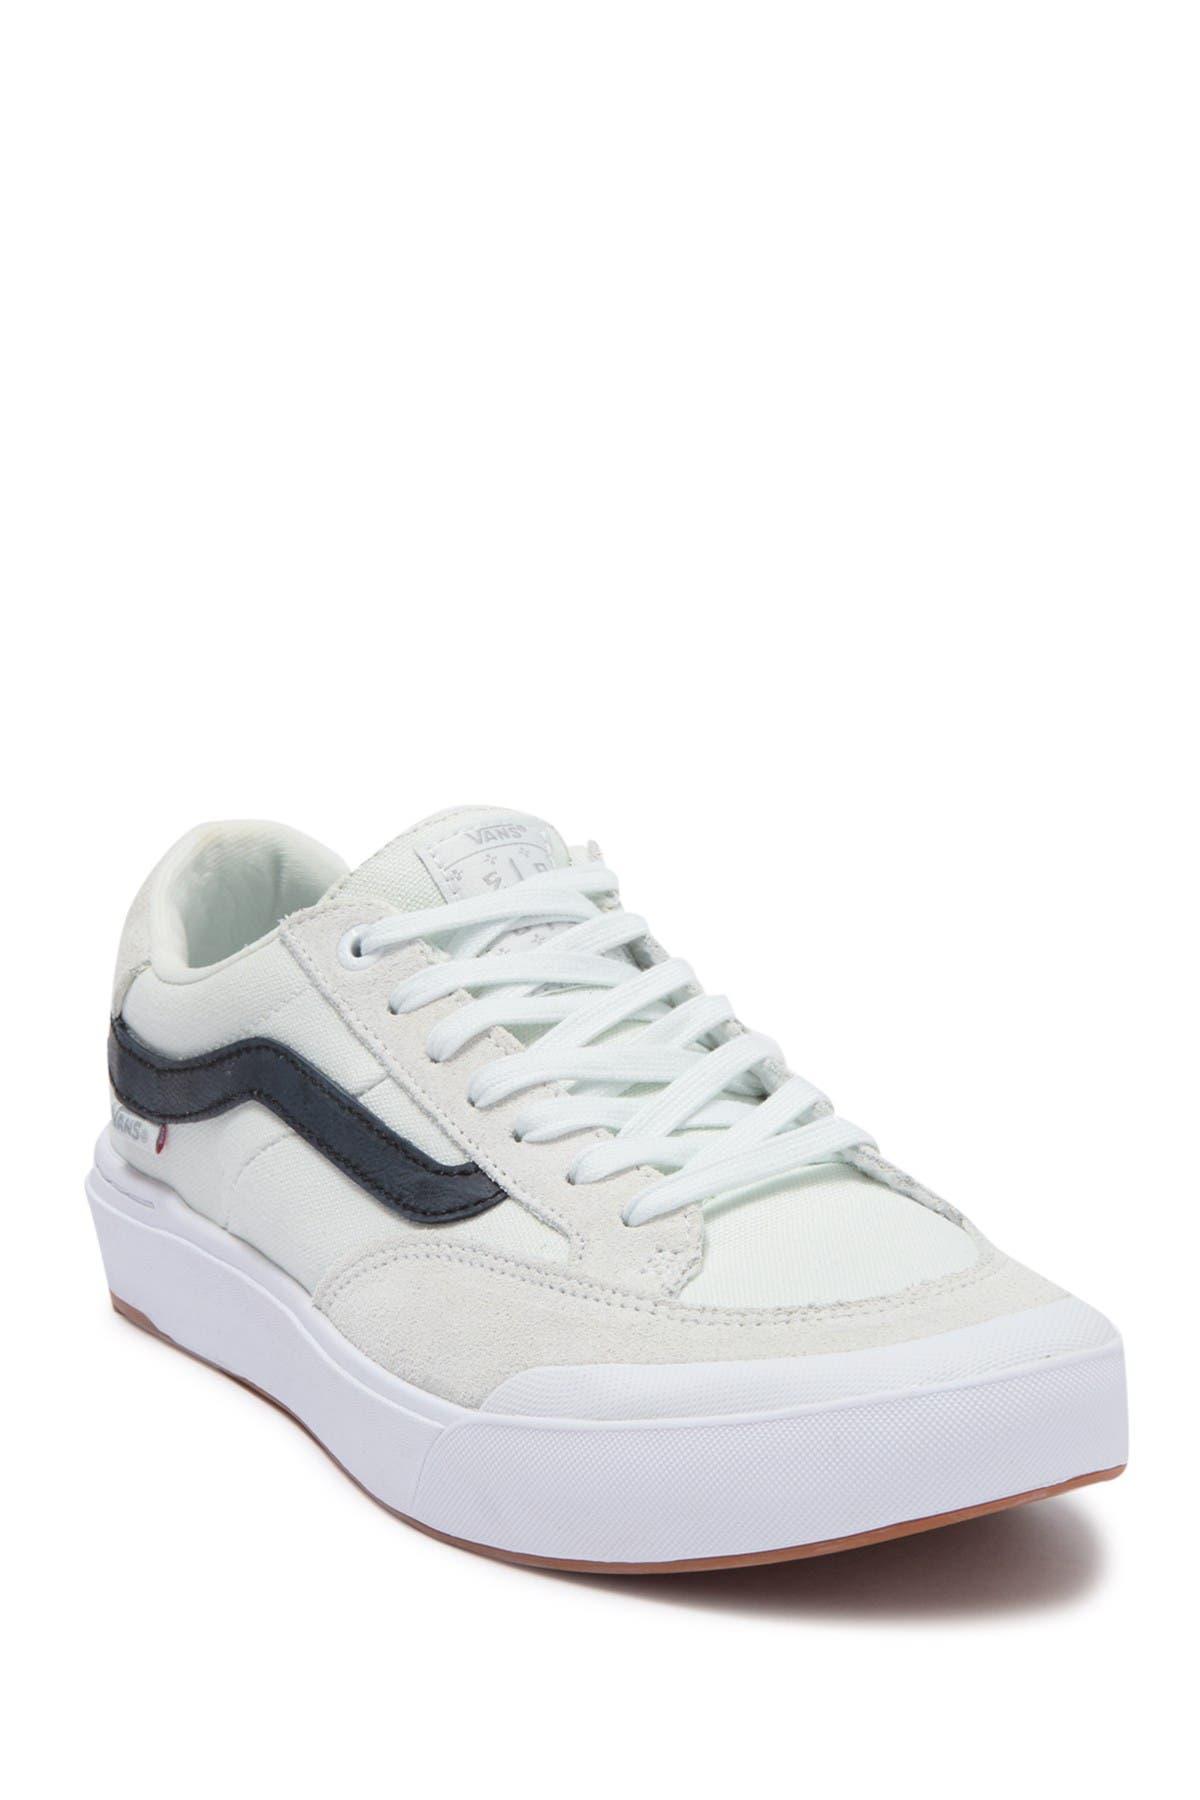 VANS   Berle Pro Sneaker   Nordstrom Rack